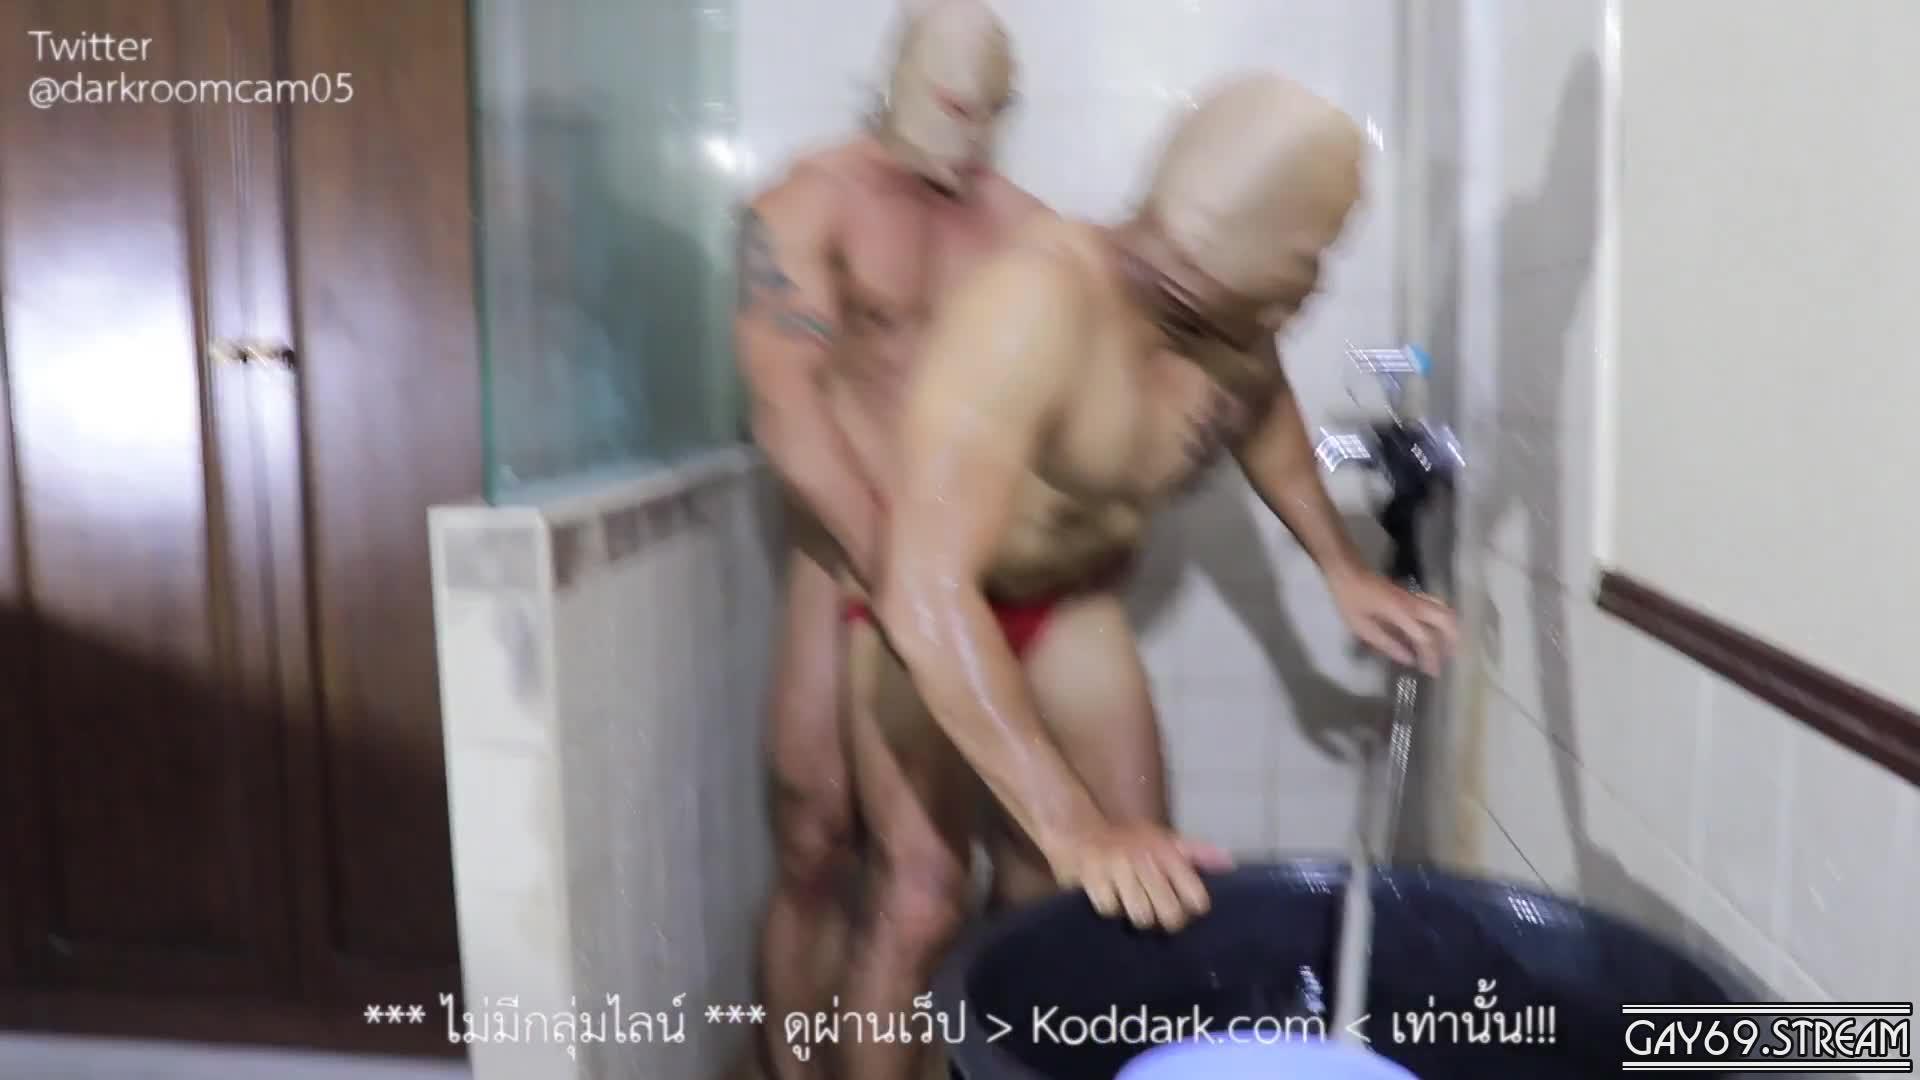 【HD】【OF】 Koddark 19_20210708